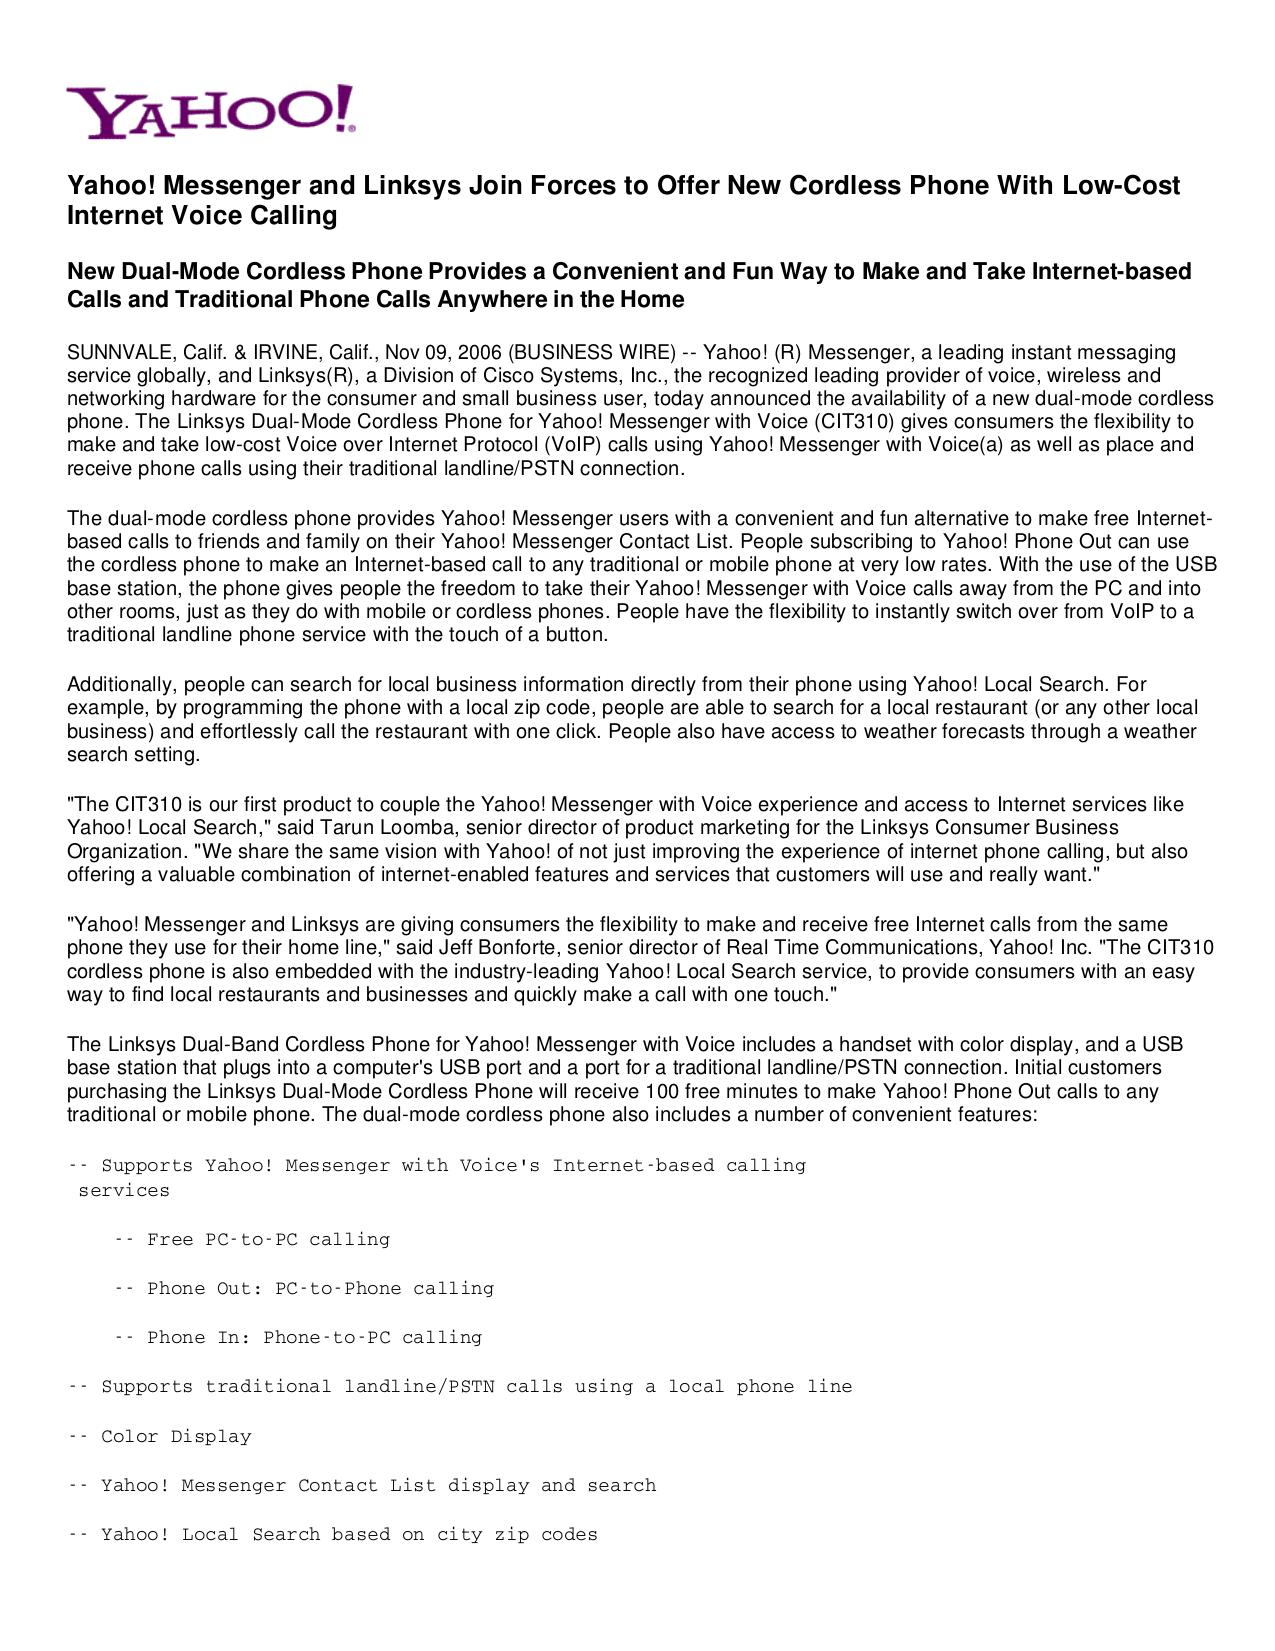 pdf for Linksys Telephone CIT310 manual